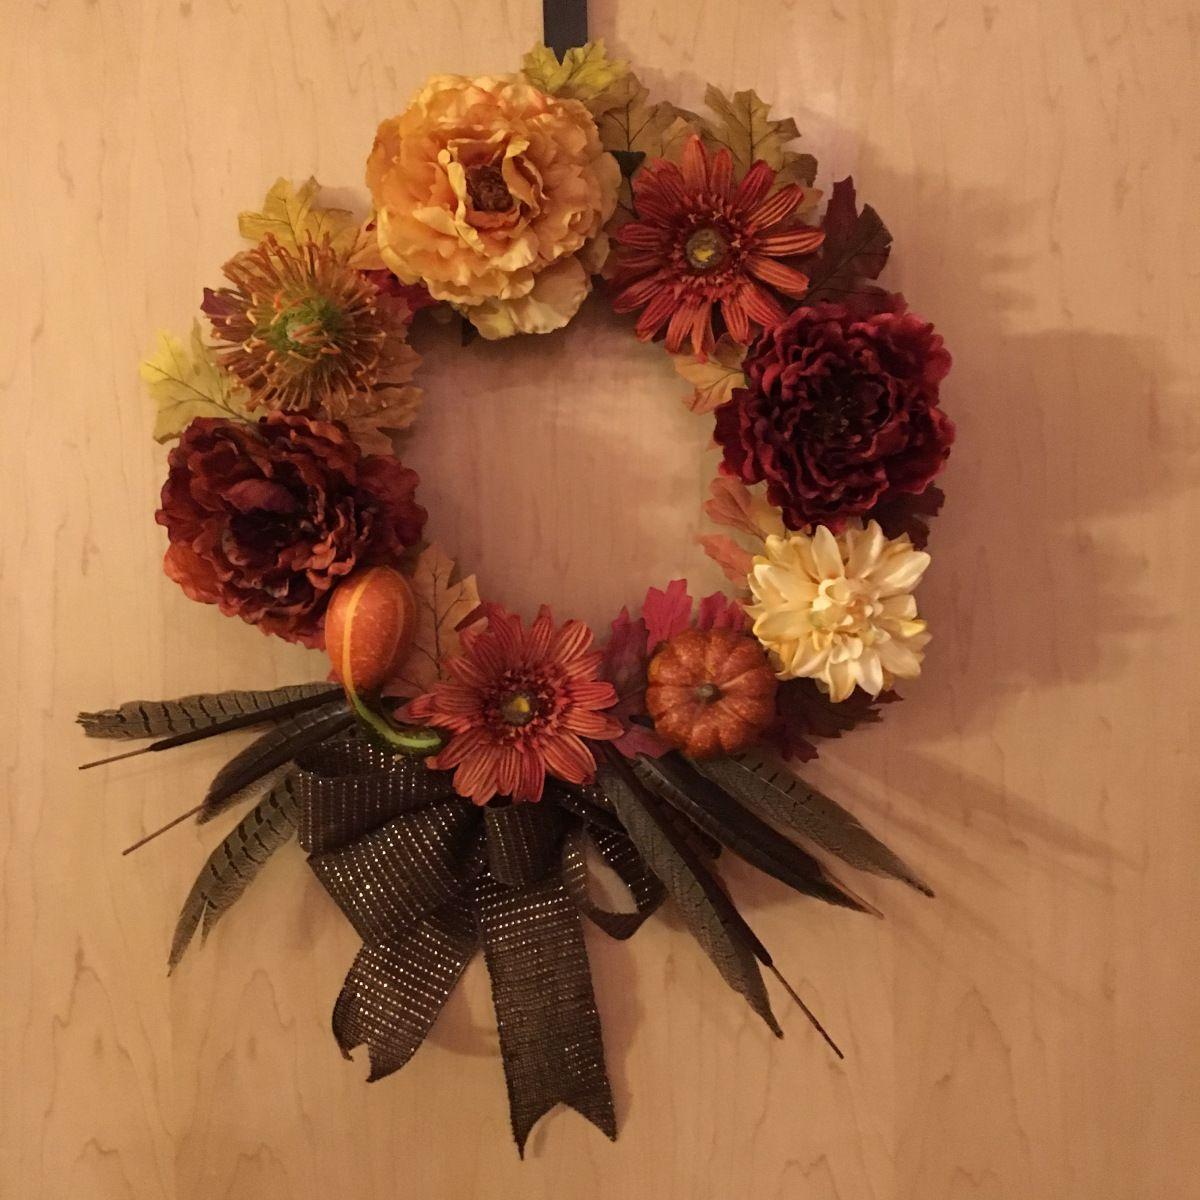 Fall Caregiver Gifts Caregiver gifts, Holiday cheer, Fall